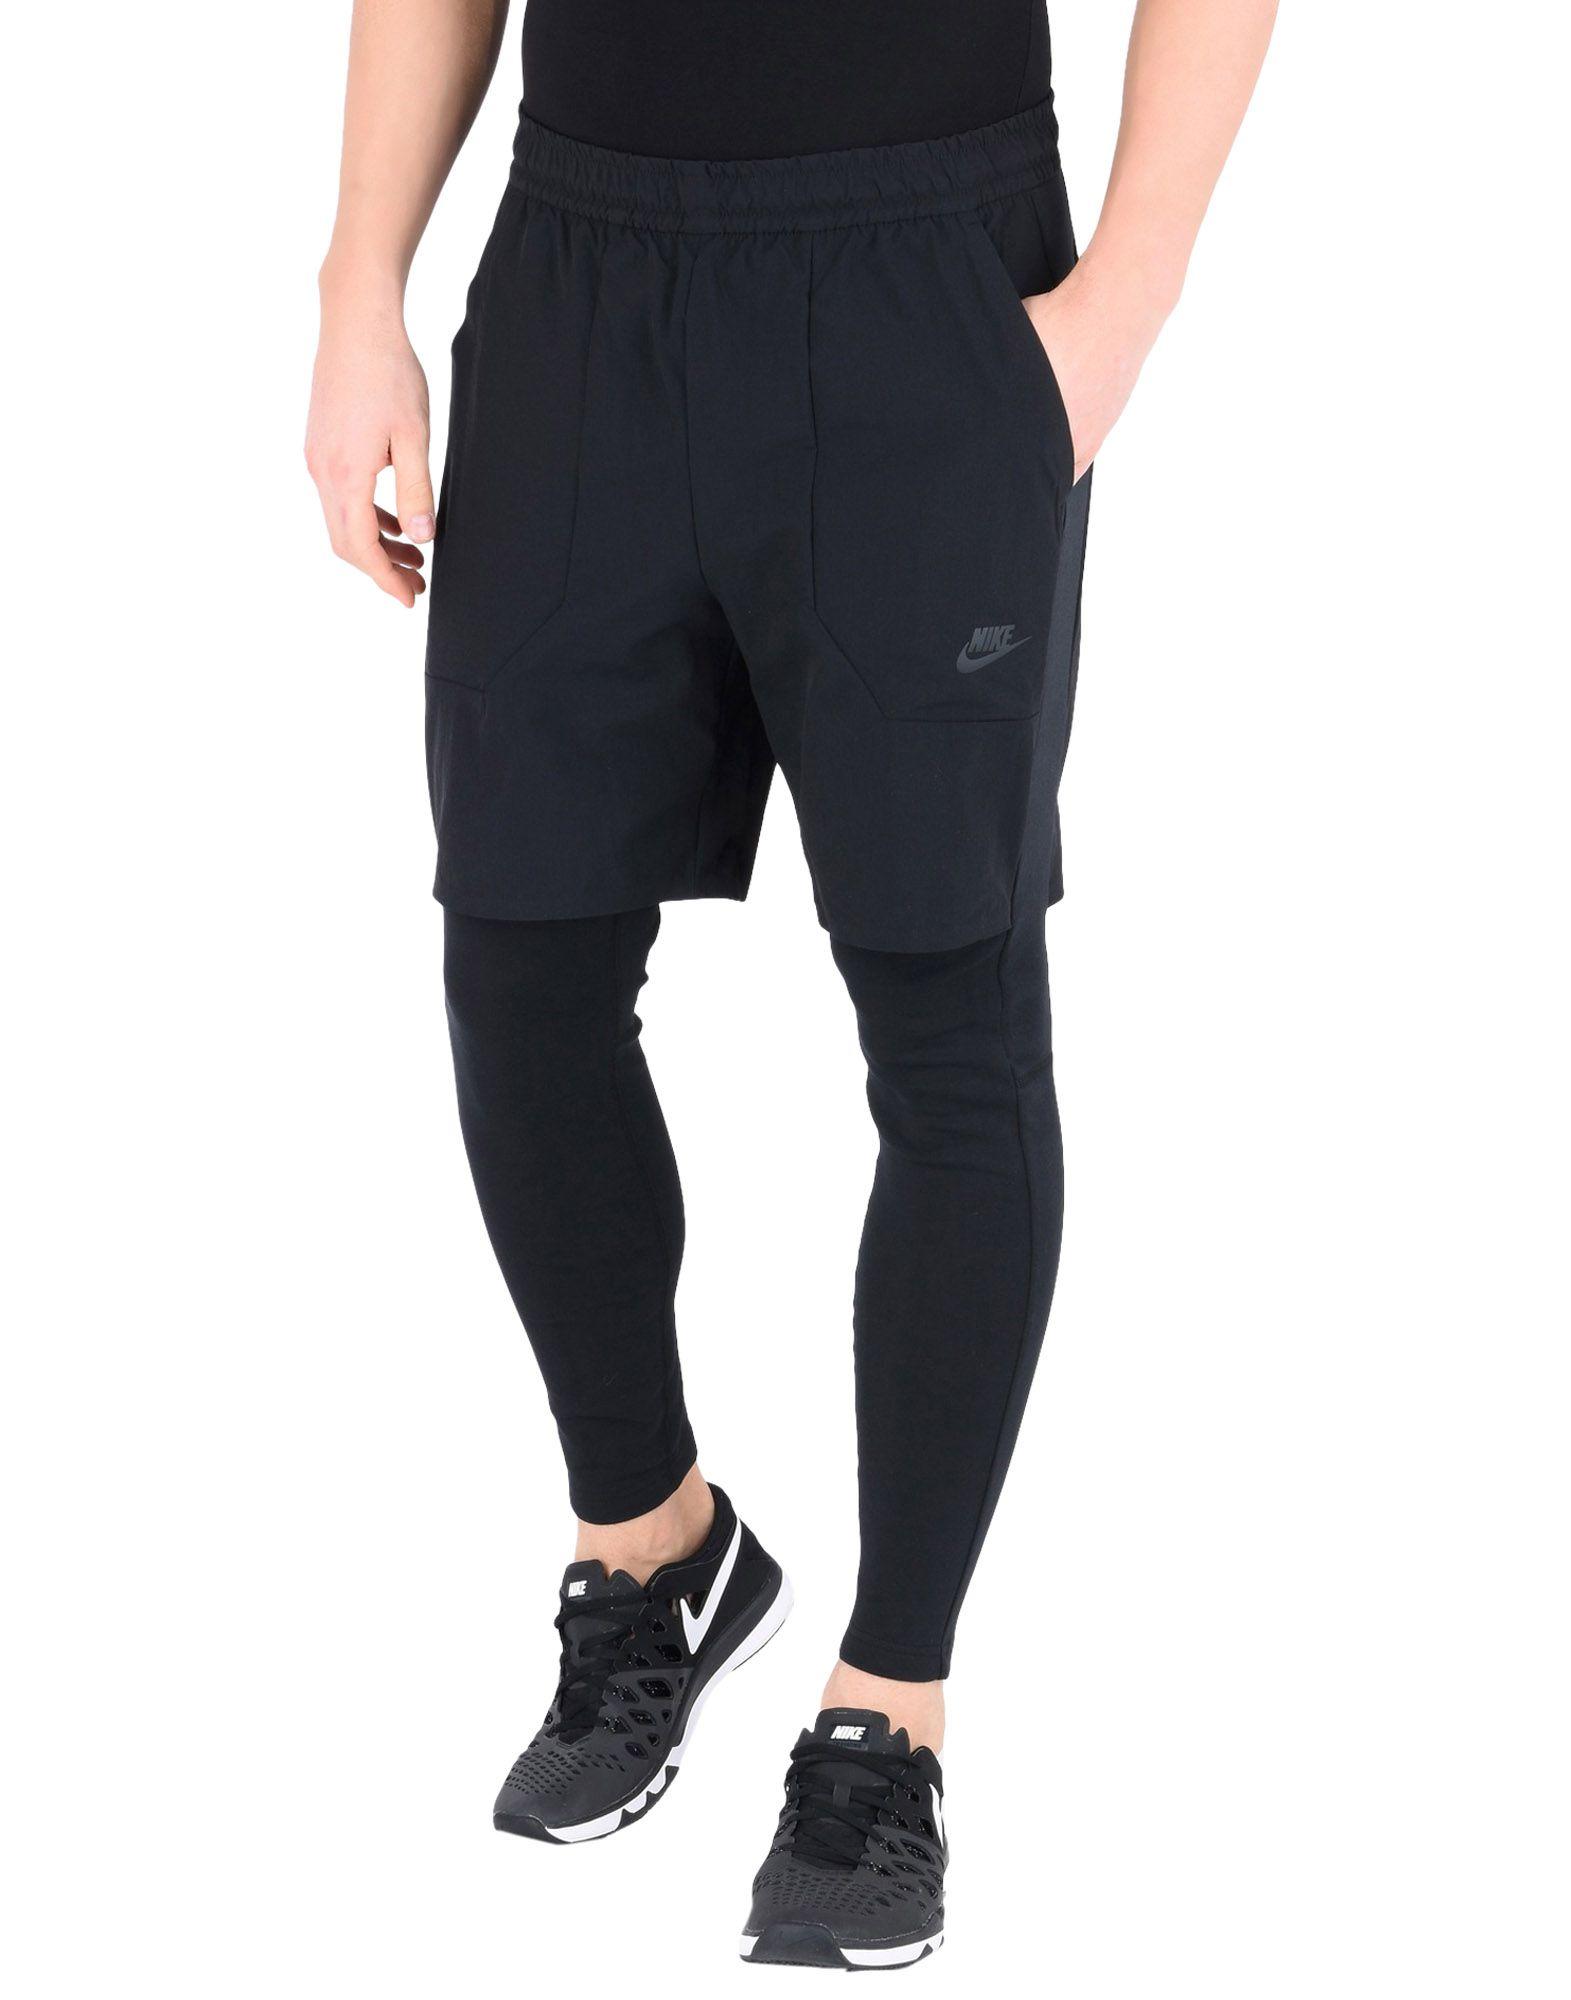 Pantalone Nike  Tech Fleece Pant 2In1 - Uomo - Acquista online su